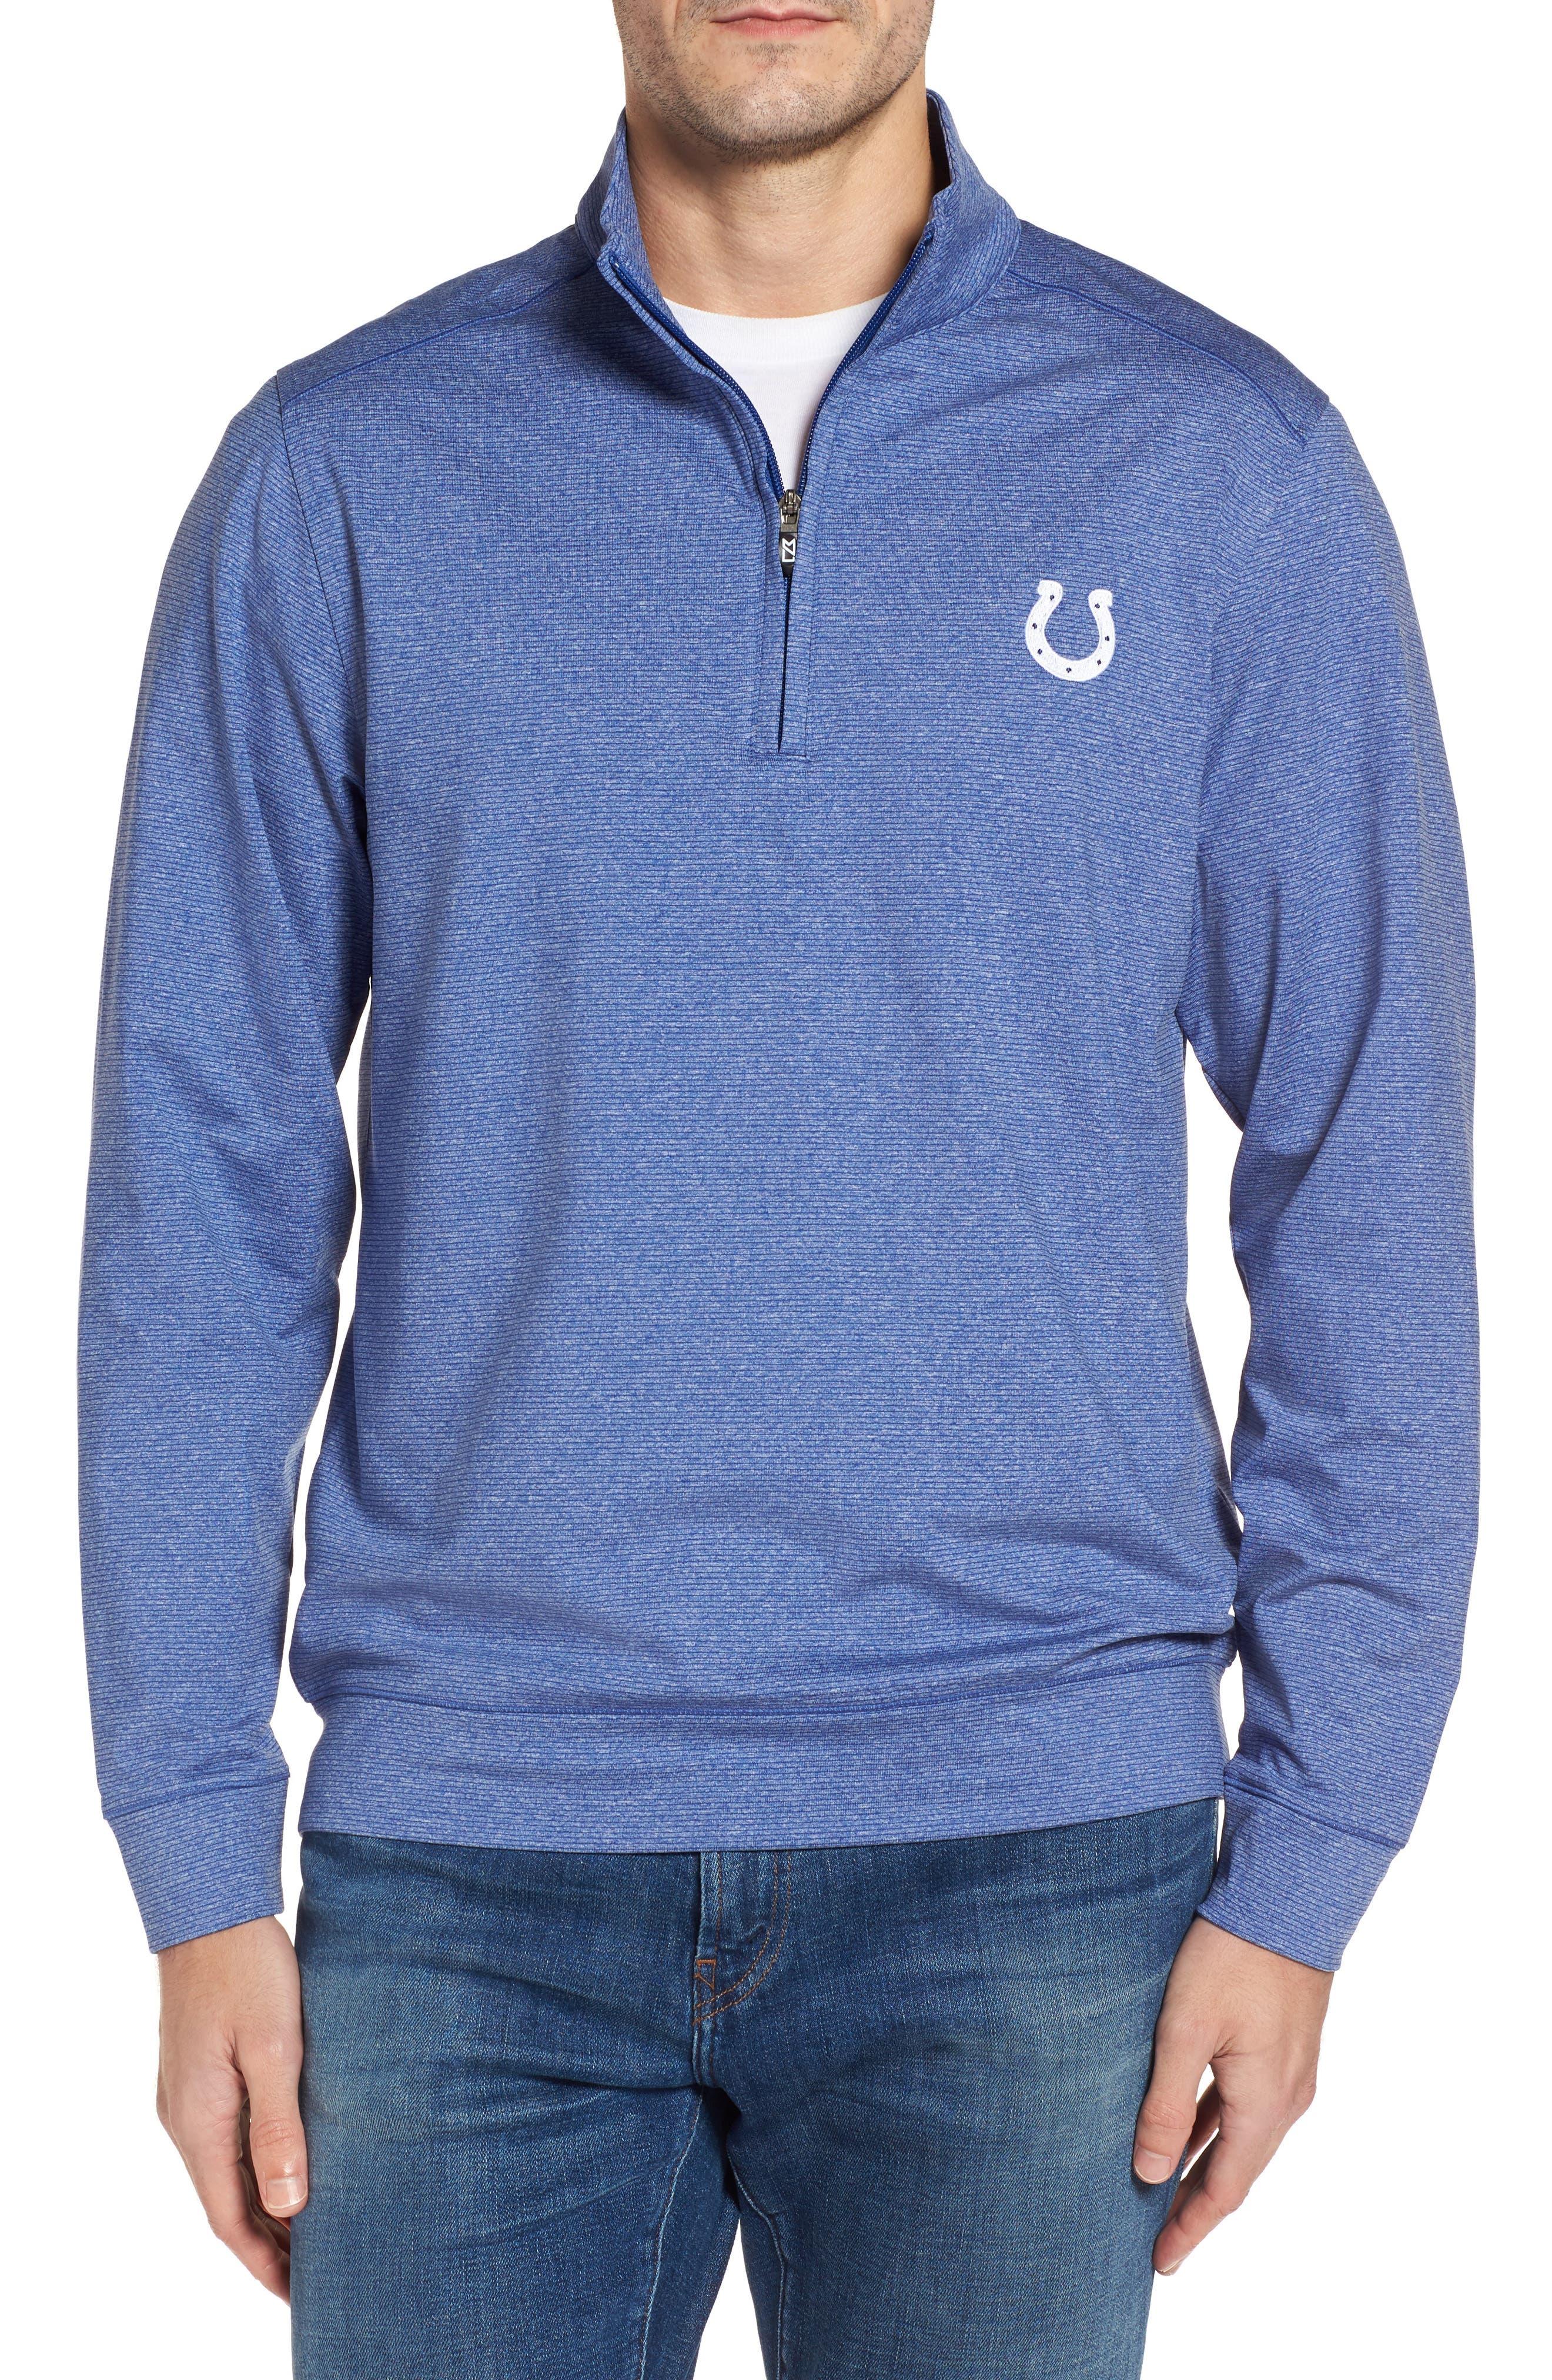 Shoreline - Indianapolis Colts Half Zip Pullover,                             Main thumbnail 1, color,                             Tour Blue Heather